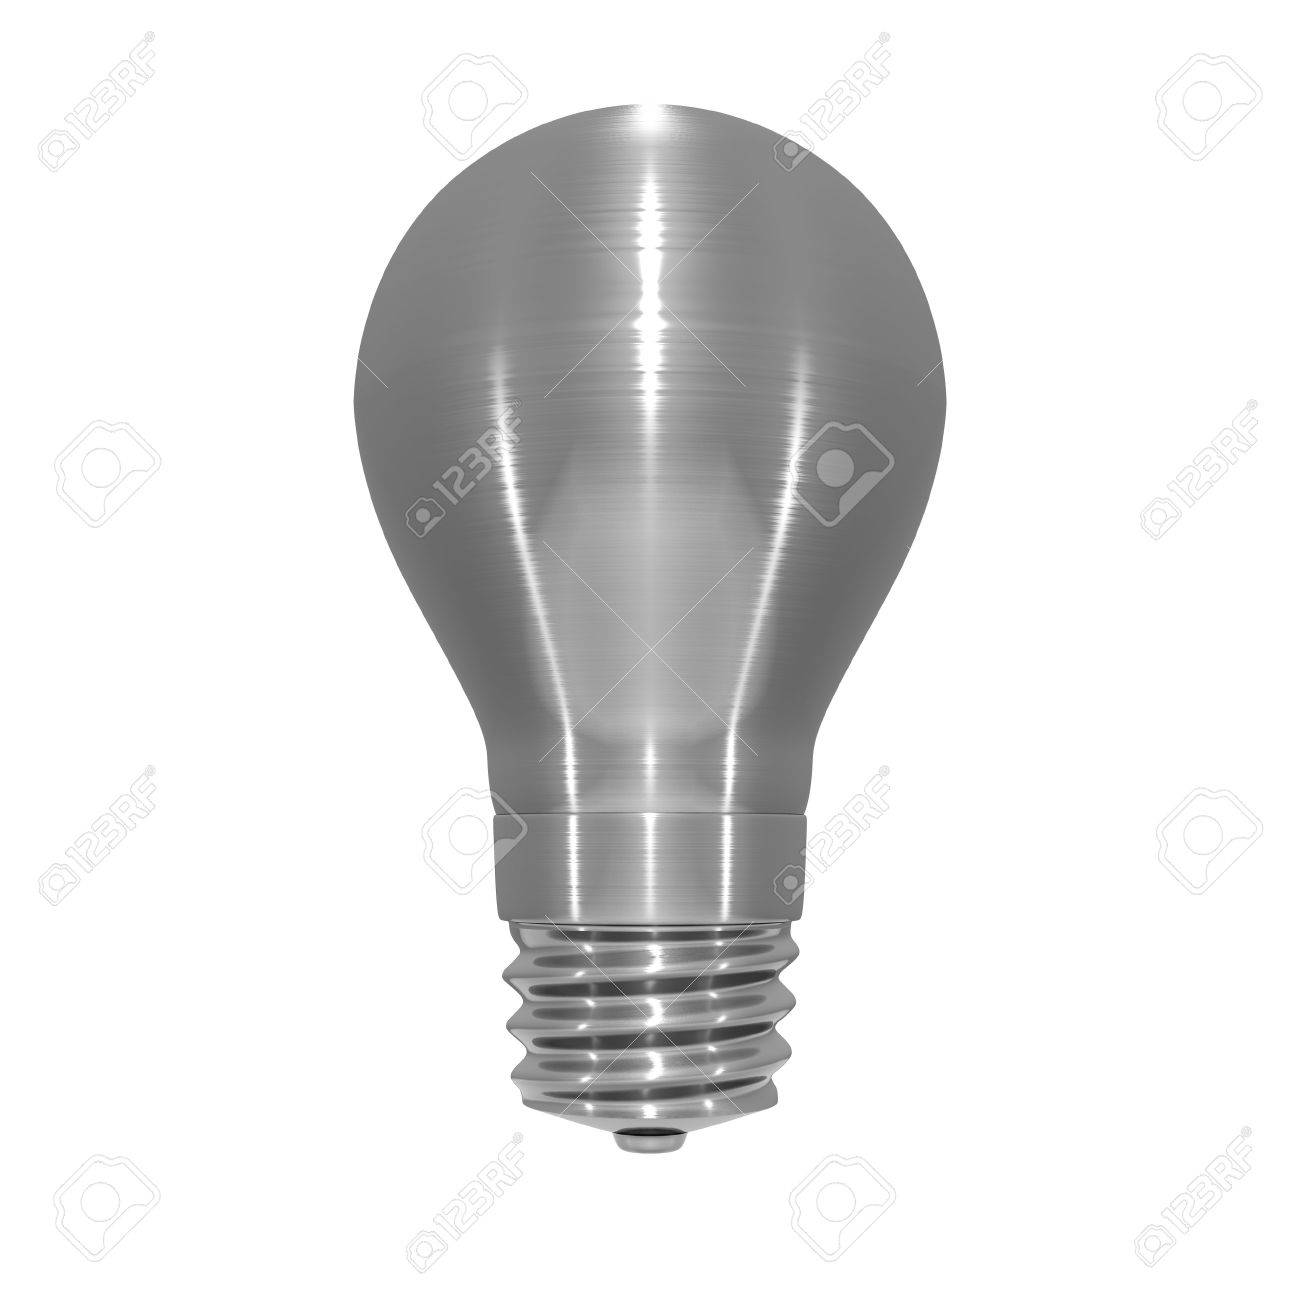 3D illustration of metallic, brushed steel effect light bulb on white background - 5875874